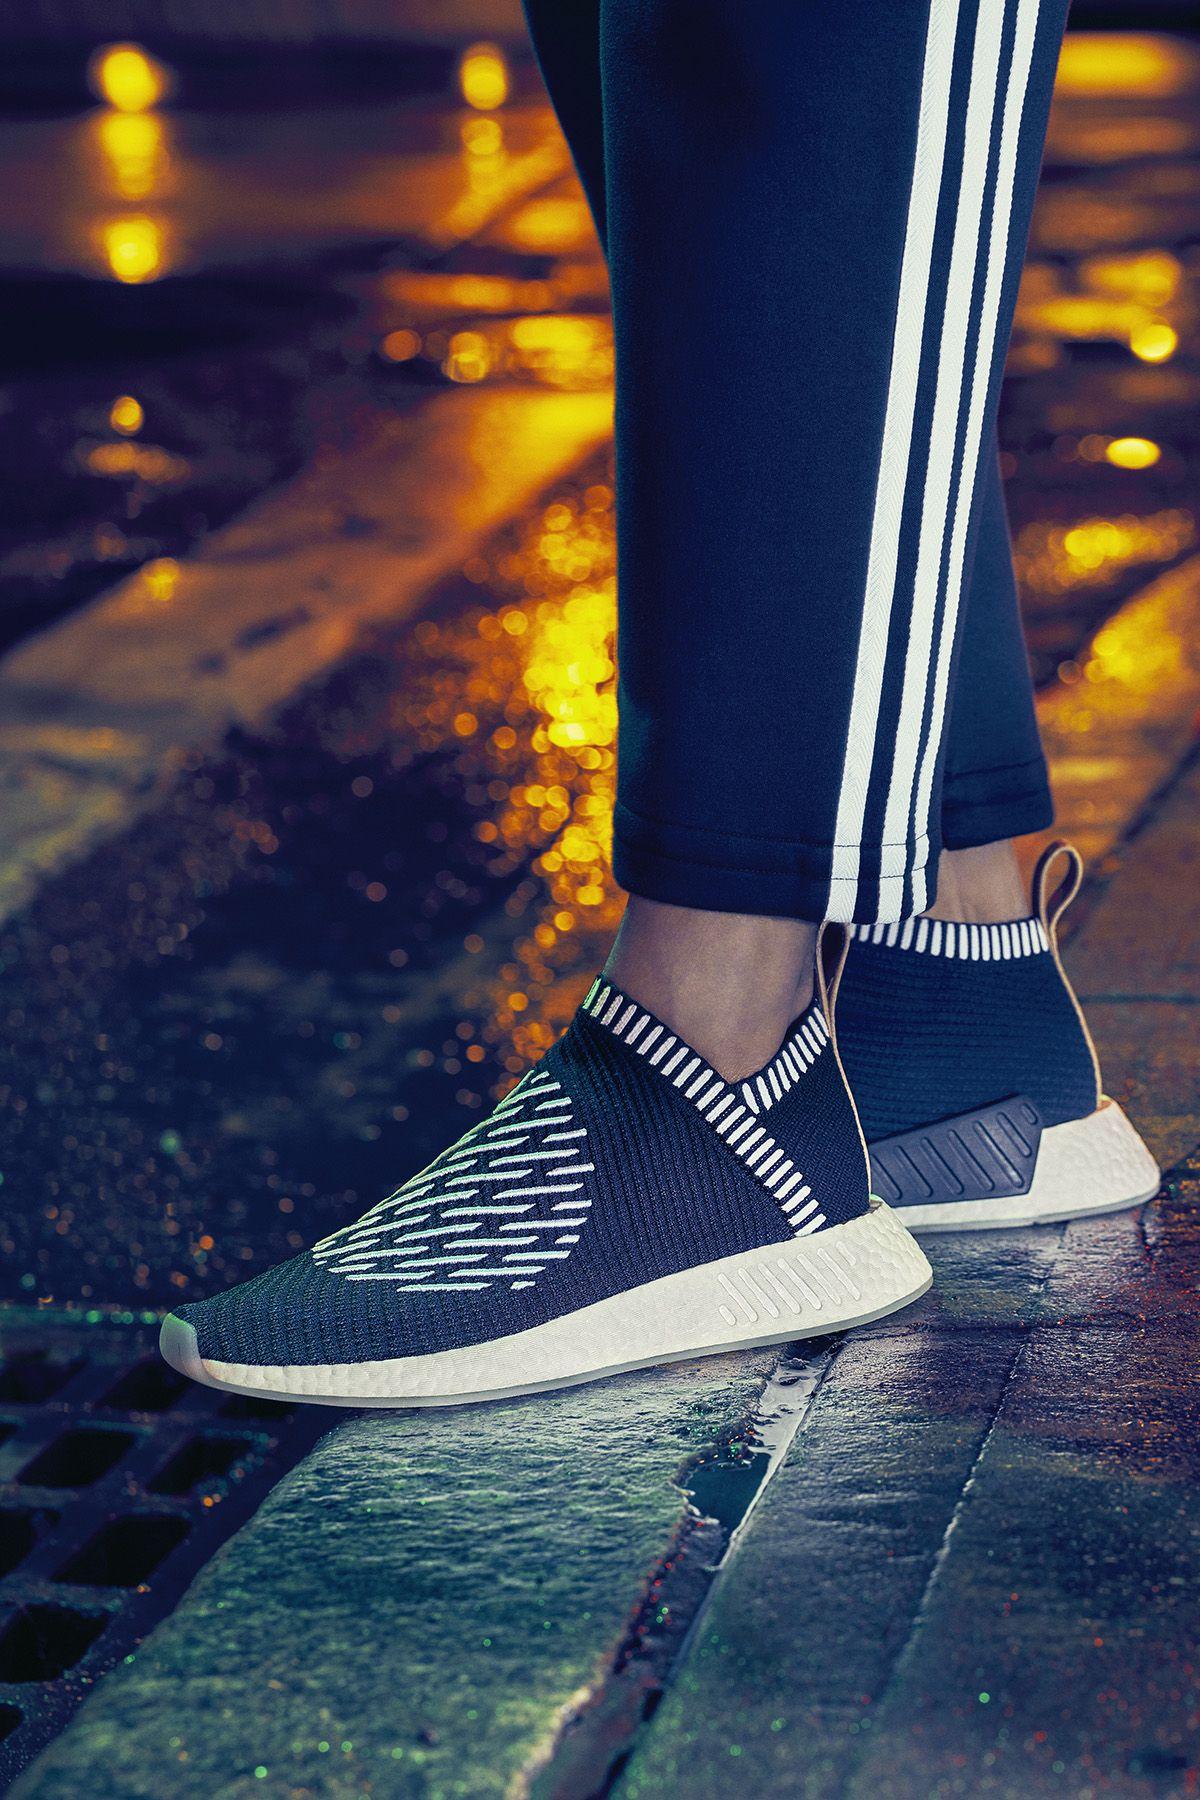 8fc62b318 adidas Originals NMD CS2 Ronin Pack - EU Kicks  Sneaker Magazine